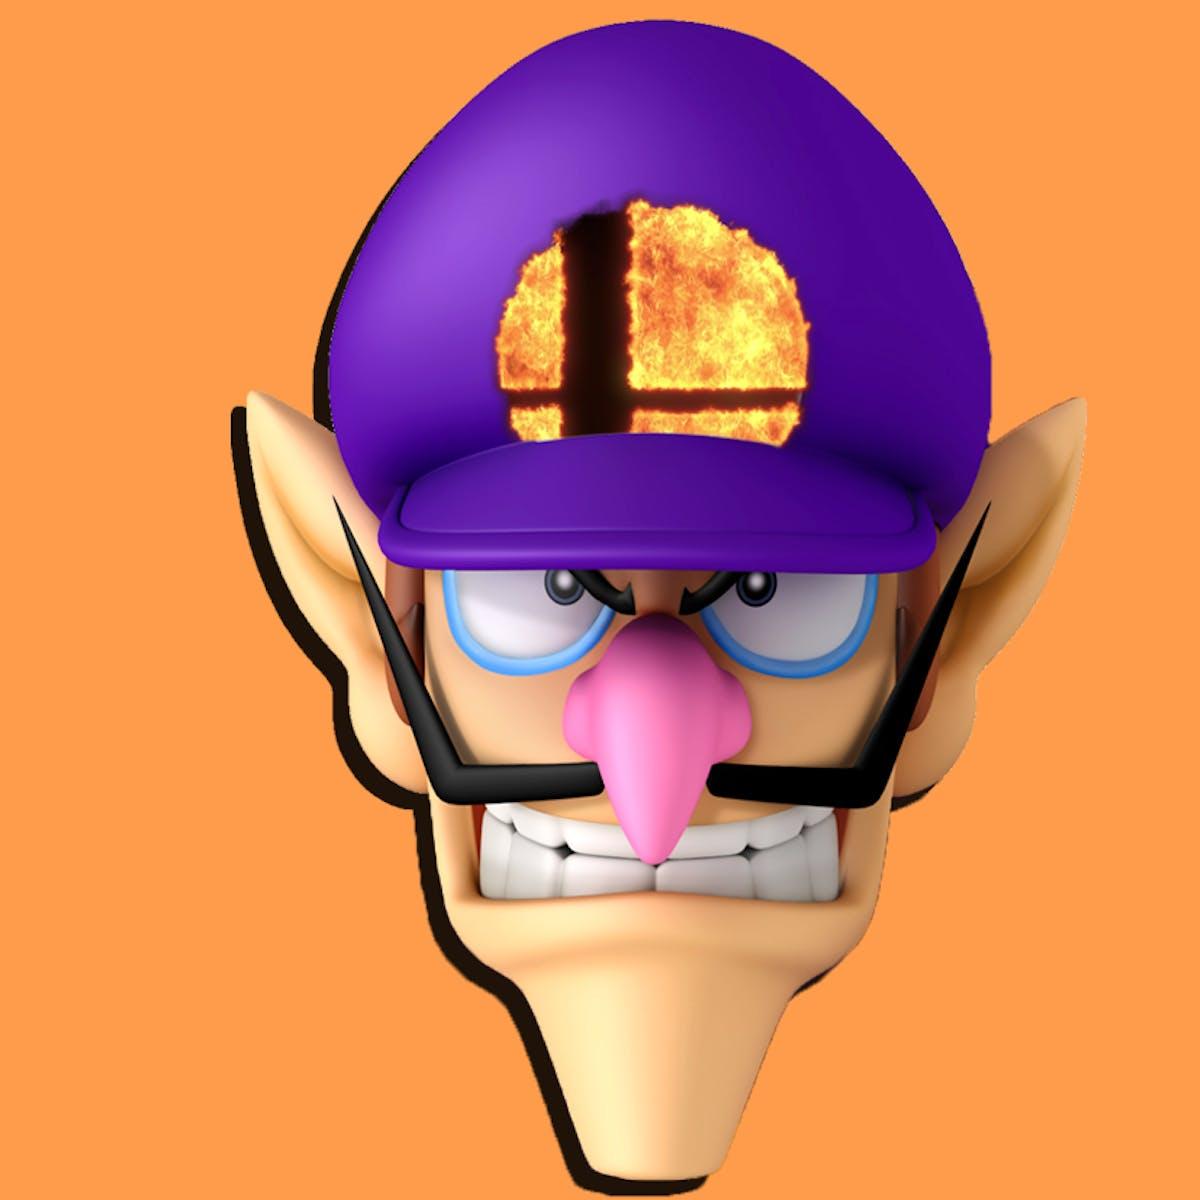 Waluigi character. Super smash bros better